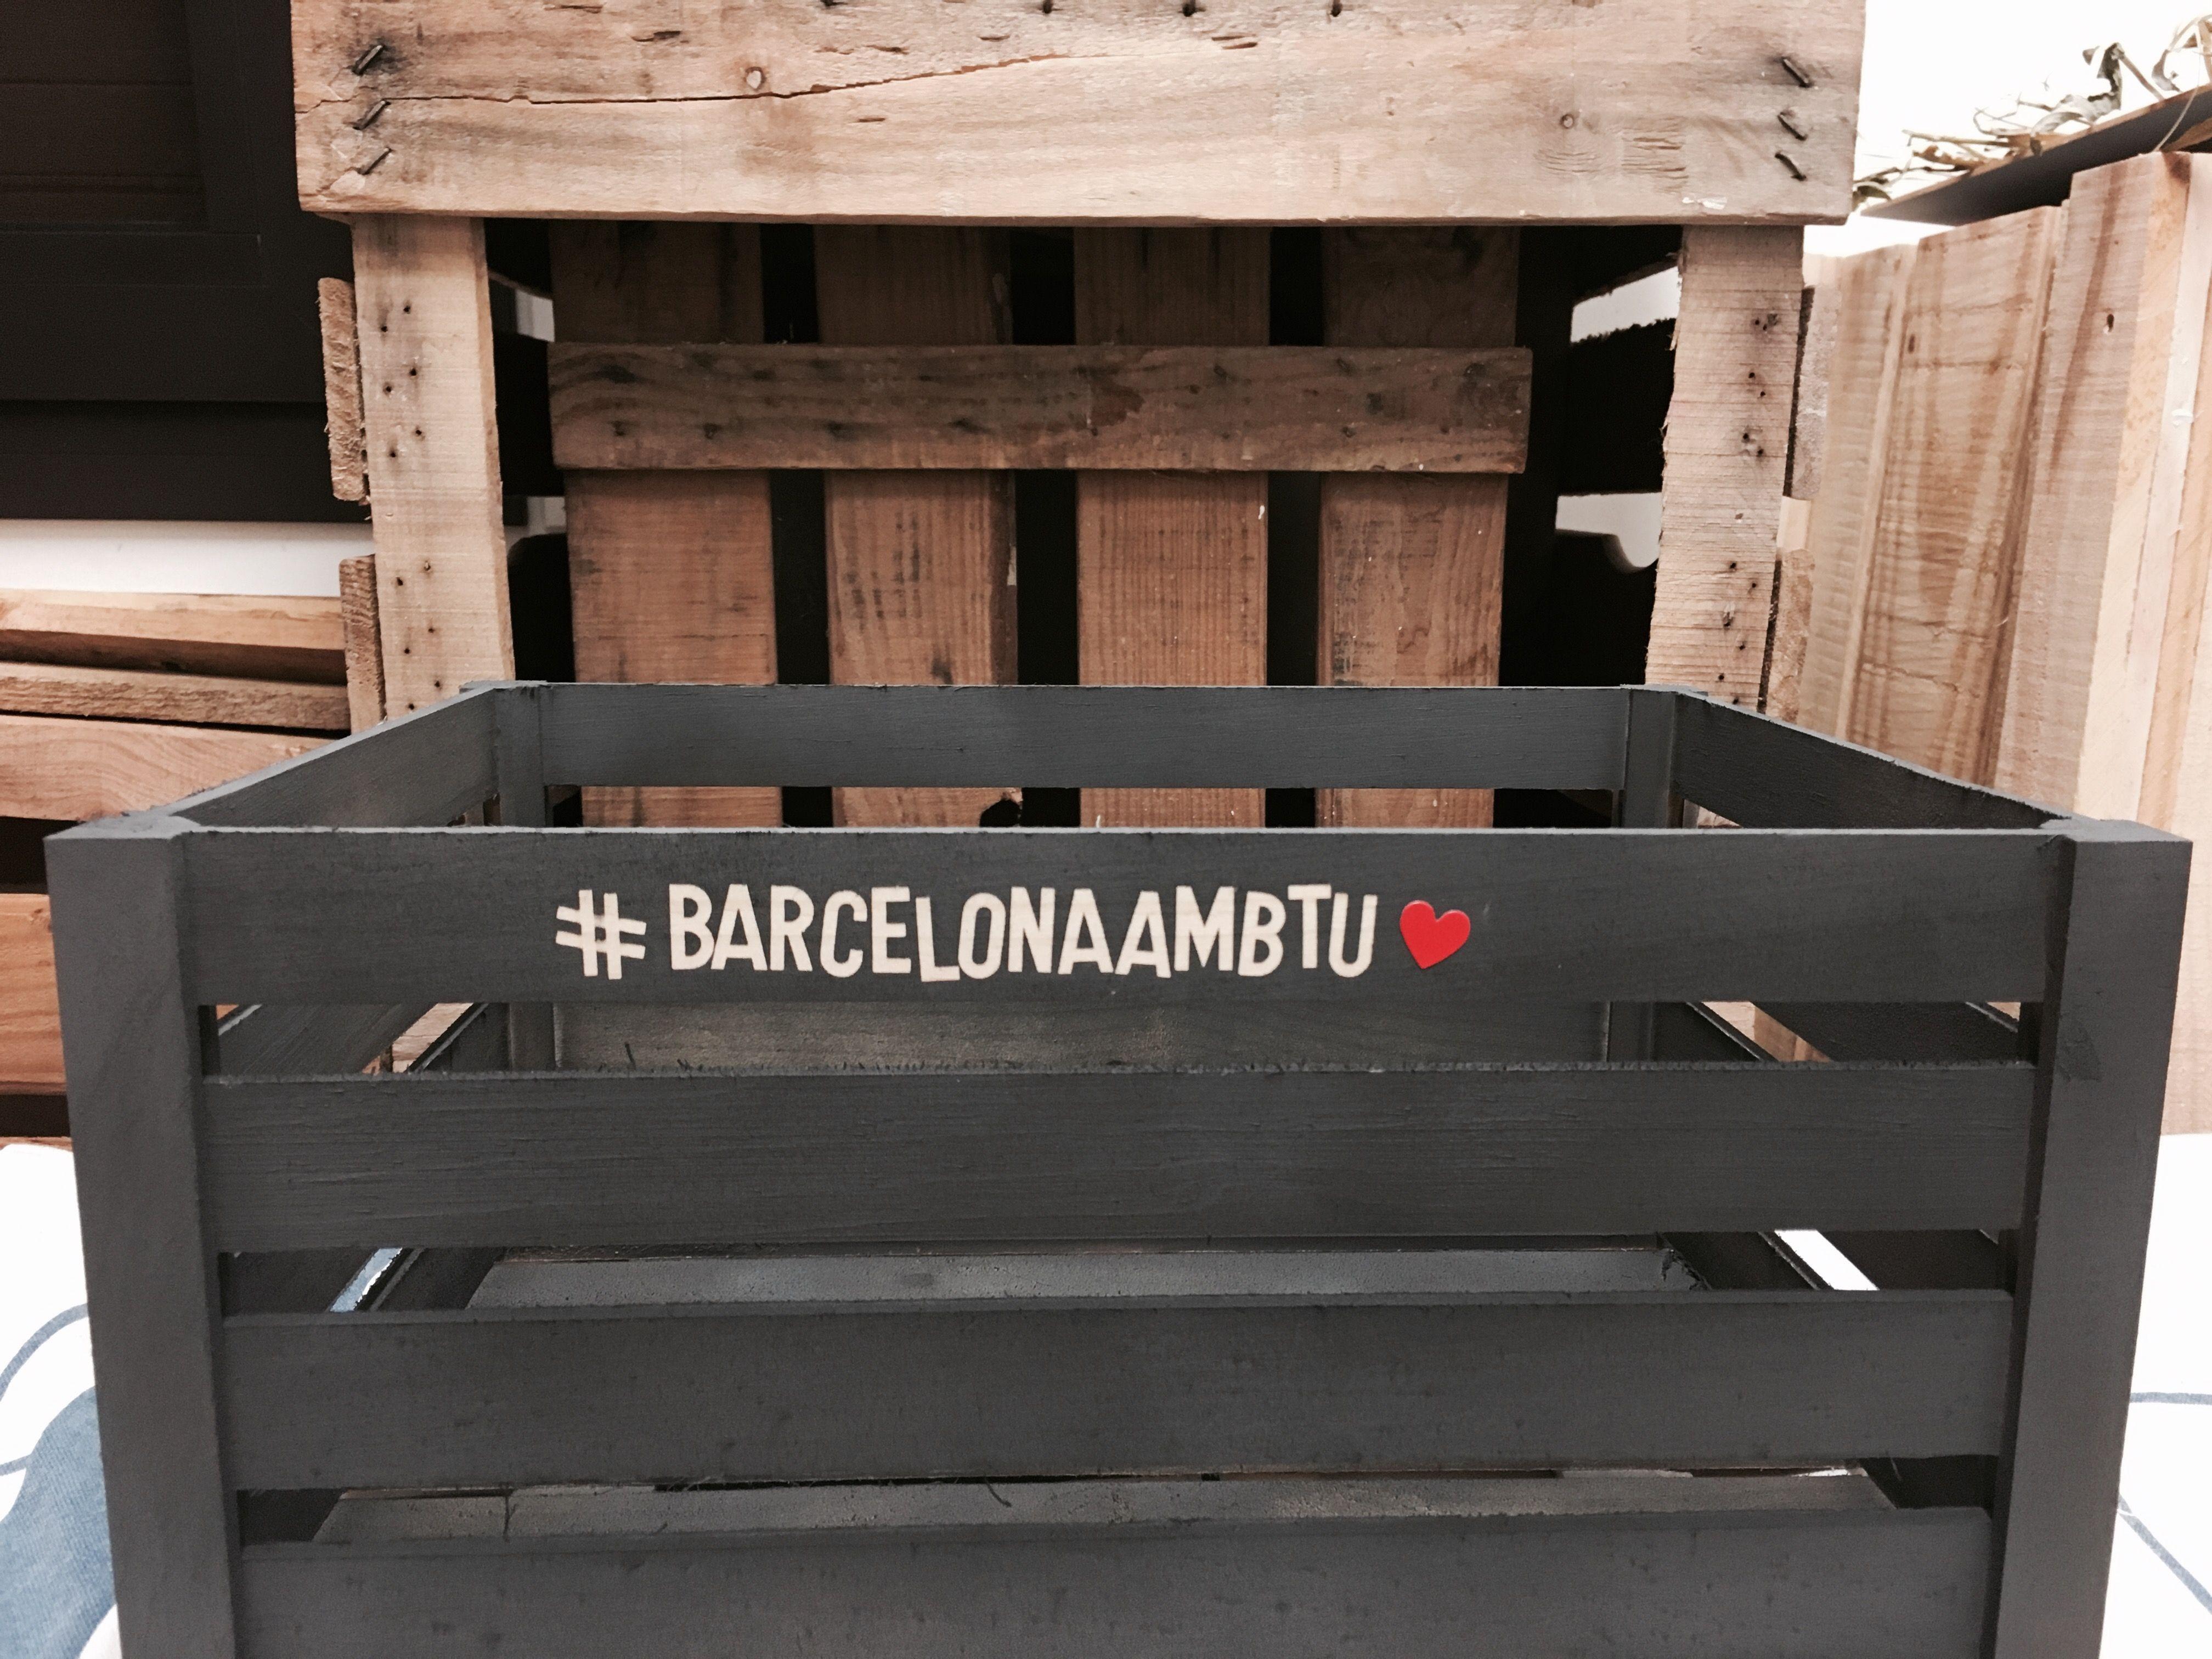 Barcelona barcelonaambtu prayforbarcelona cajas de madera decoradas proyectos handmade - Cajas de madera barcelona ...